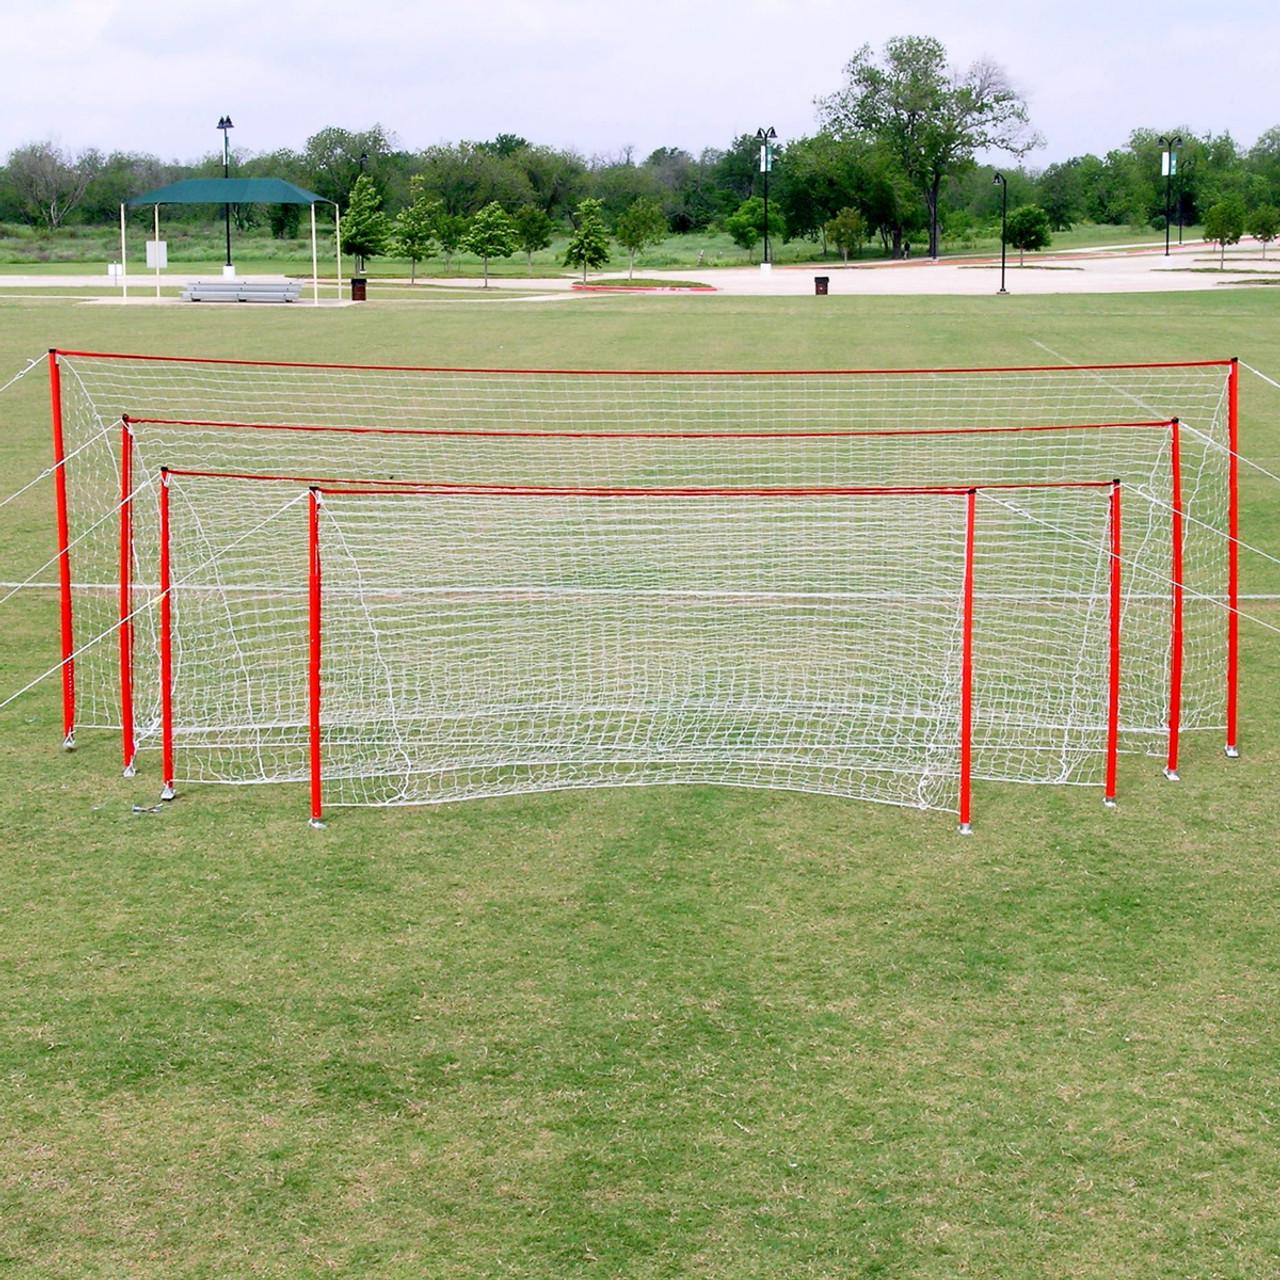 ecfb44042 ... J-Goal Regulation Size Portable Goal | Soccer Innovations Training  Equipment & Soccer Goals